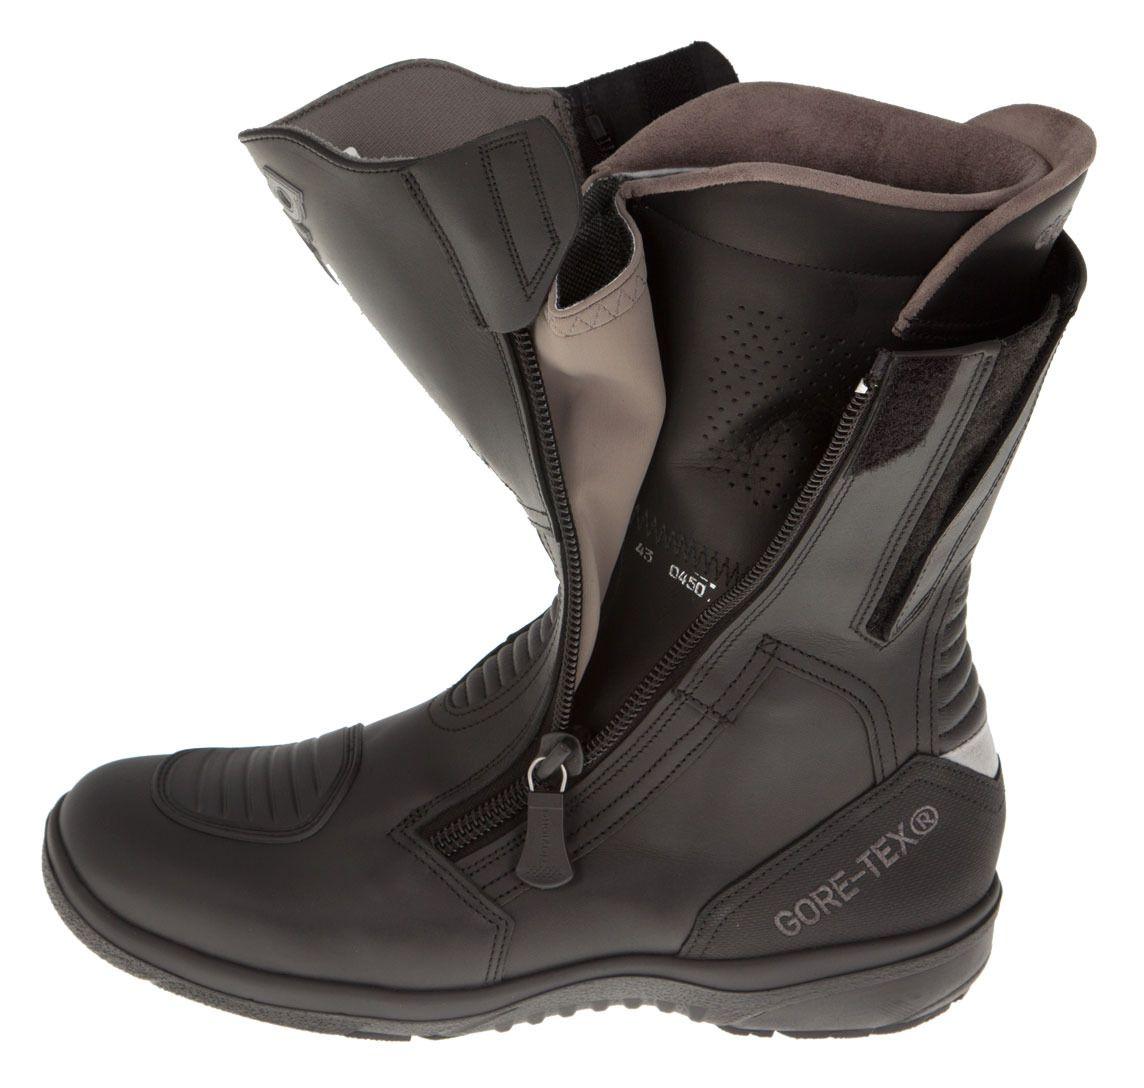 daytona_road_star_gtx_boots.jpg